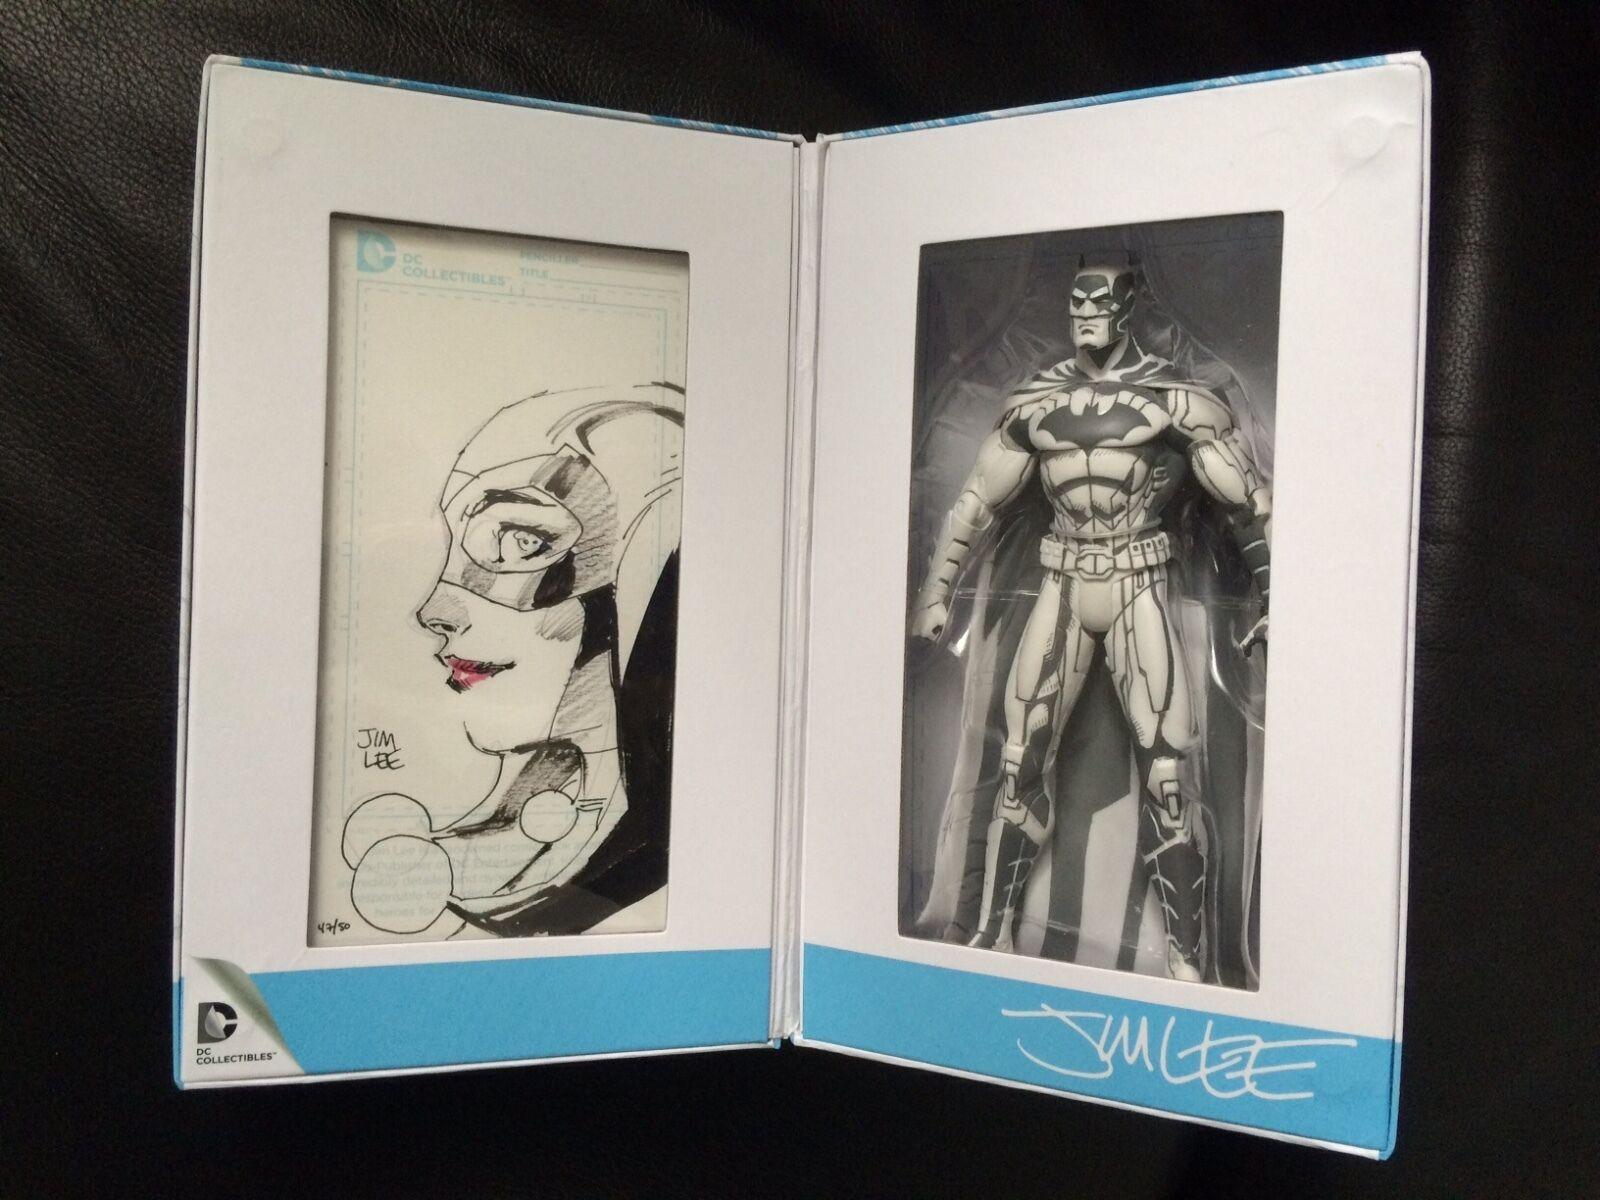 Exclusive SDCC 2015 Jim Lee Batman blueeline Figure ORIGINAL HARLEY QUINN SKETCH